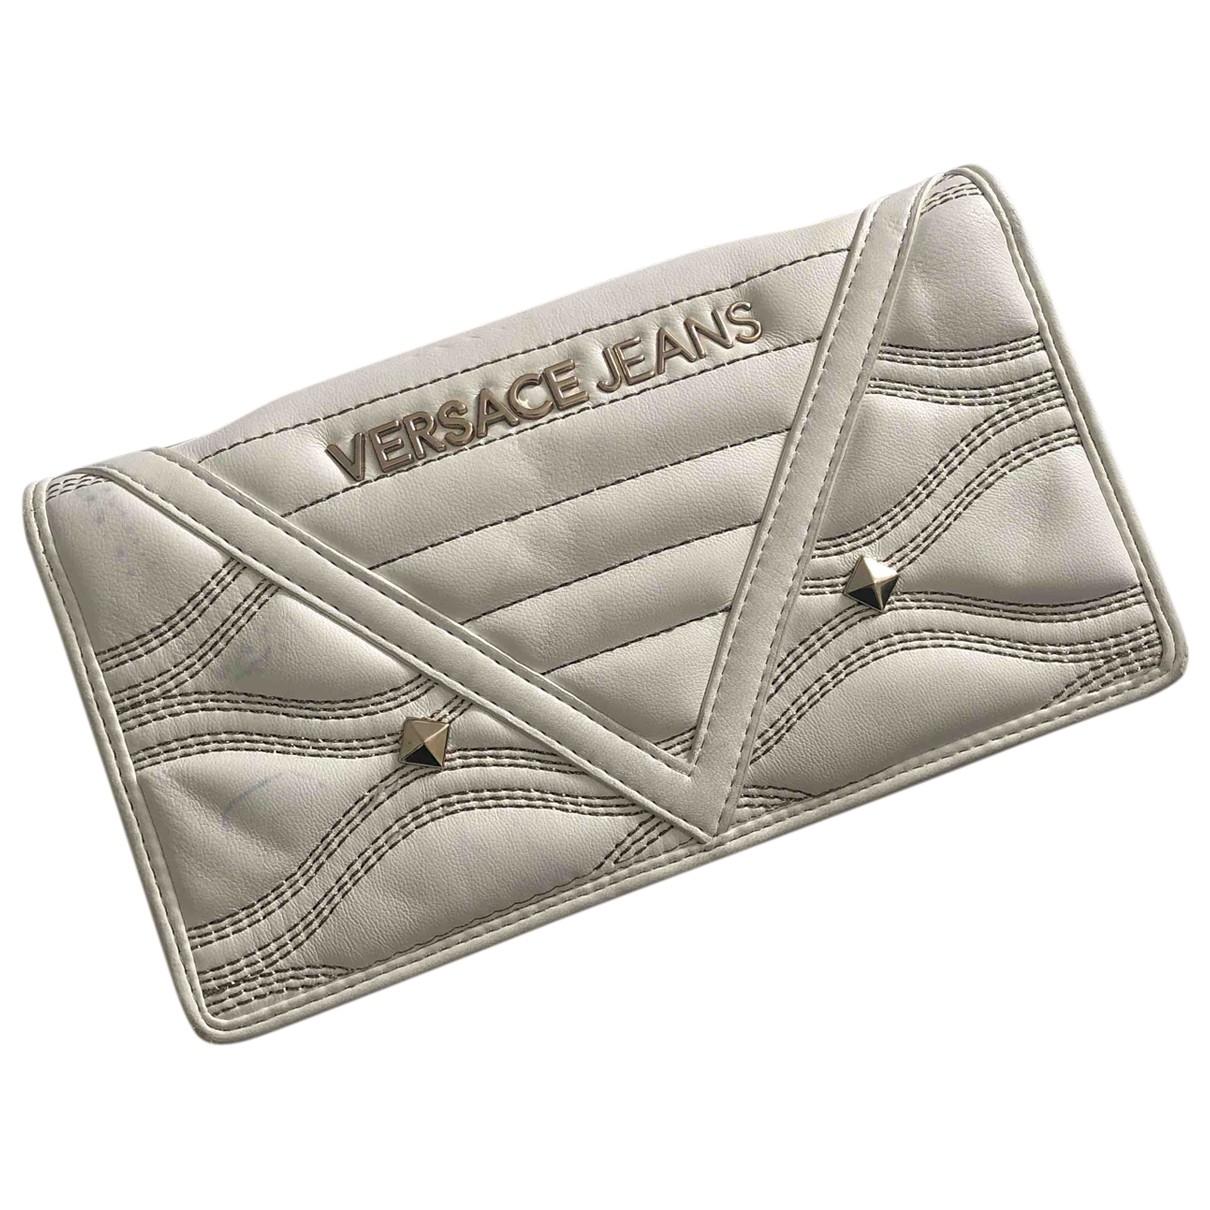 Versace Jean - Sac a main   pour femme en cuir - blanc